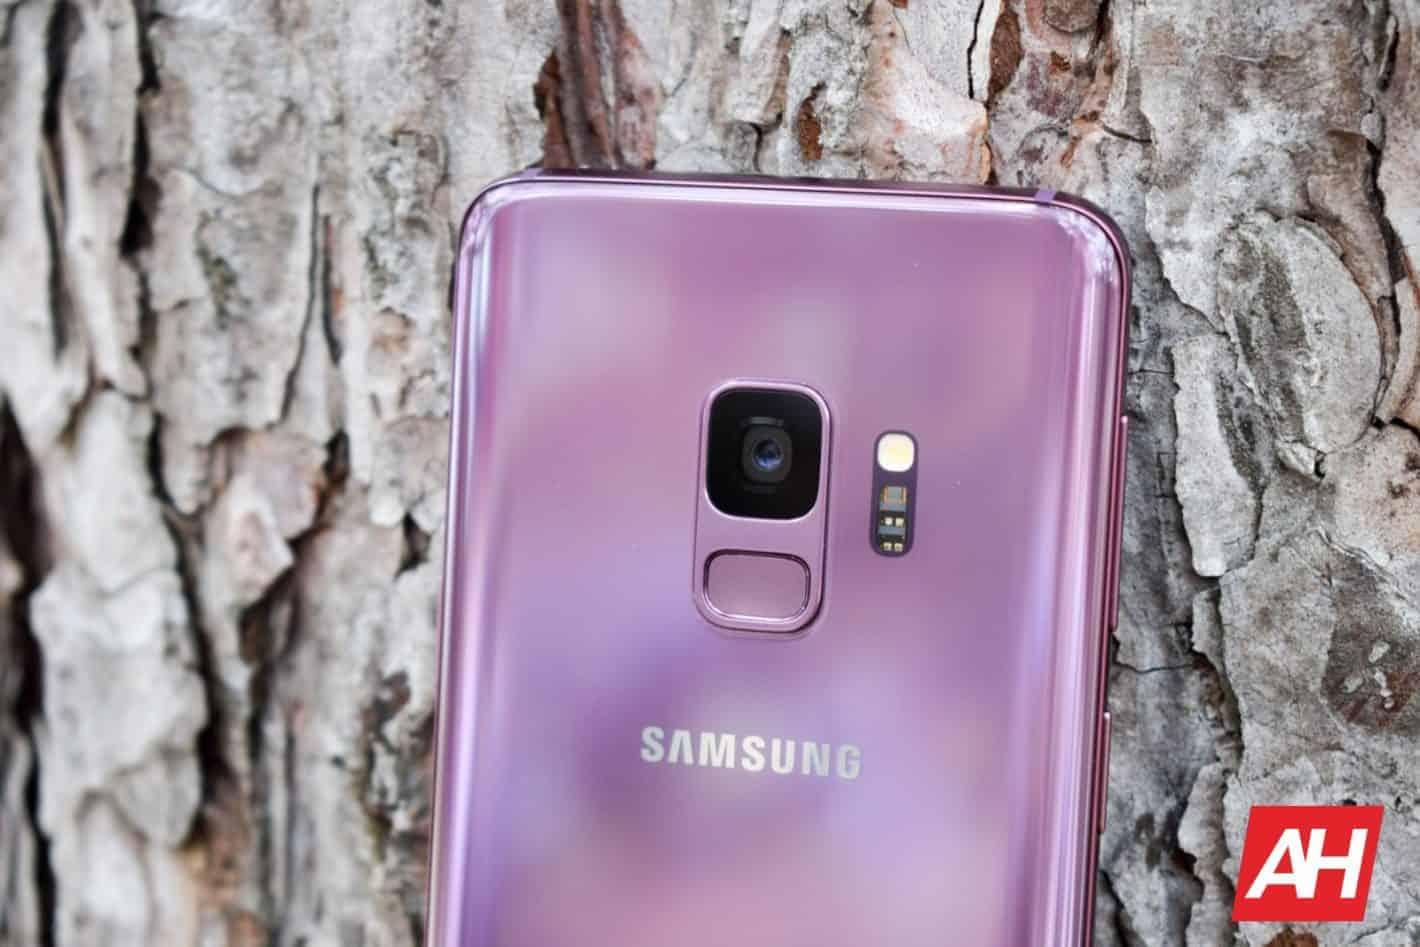 Samsung Galaxy S9 AH 2018 1